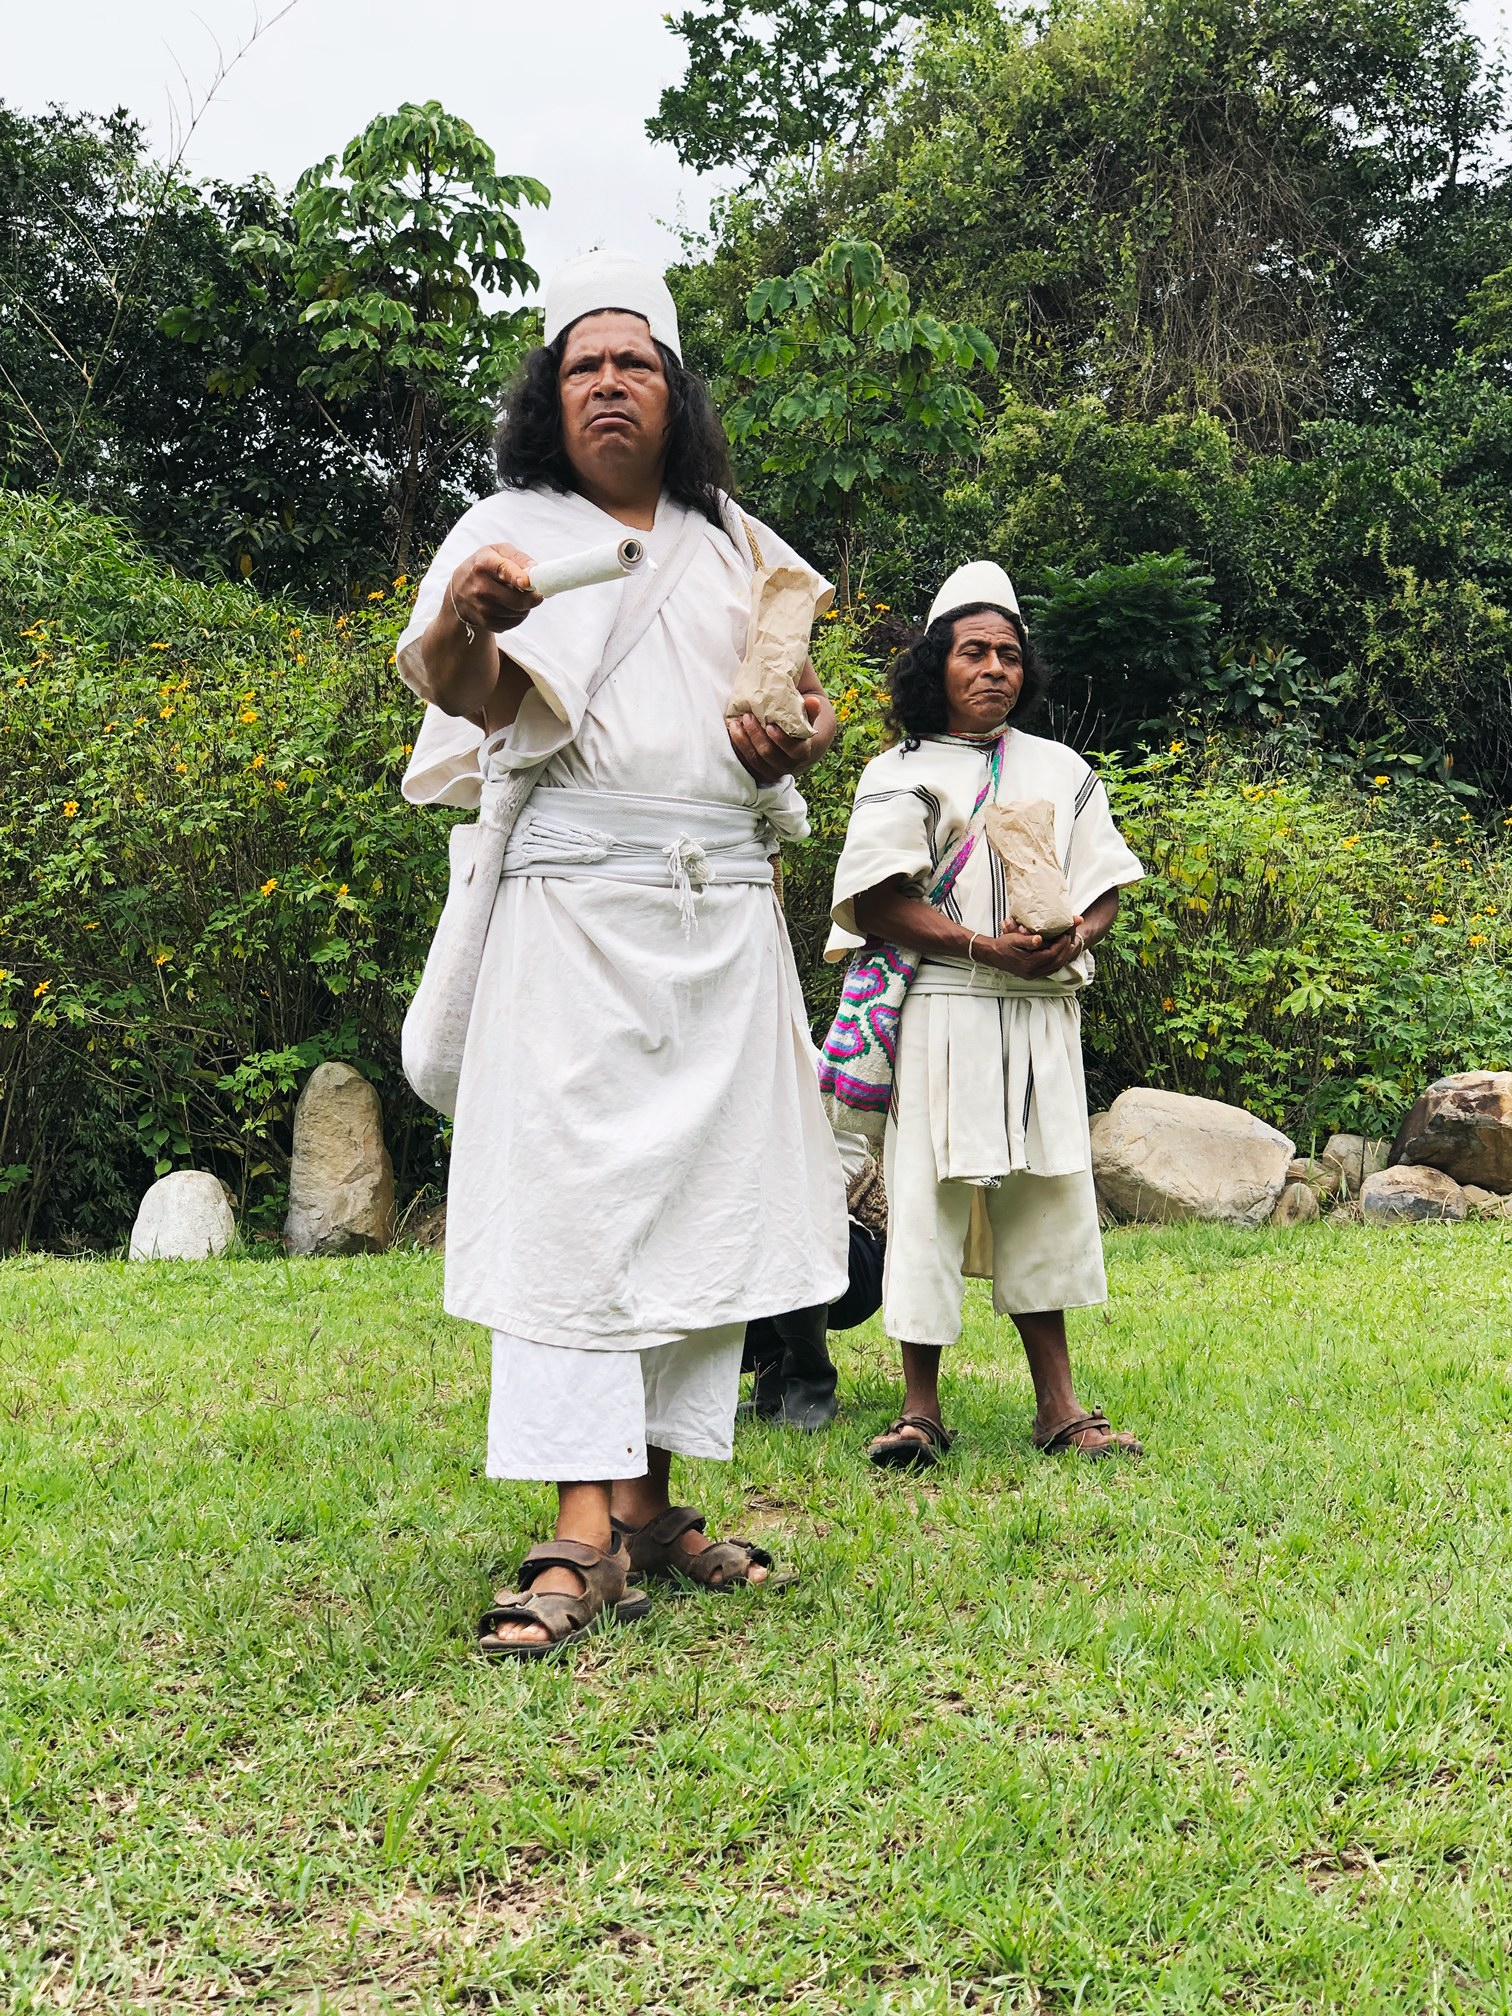 Arhuaco community leader: Mamo Photo courtesy of Hope Made In The World